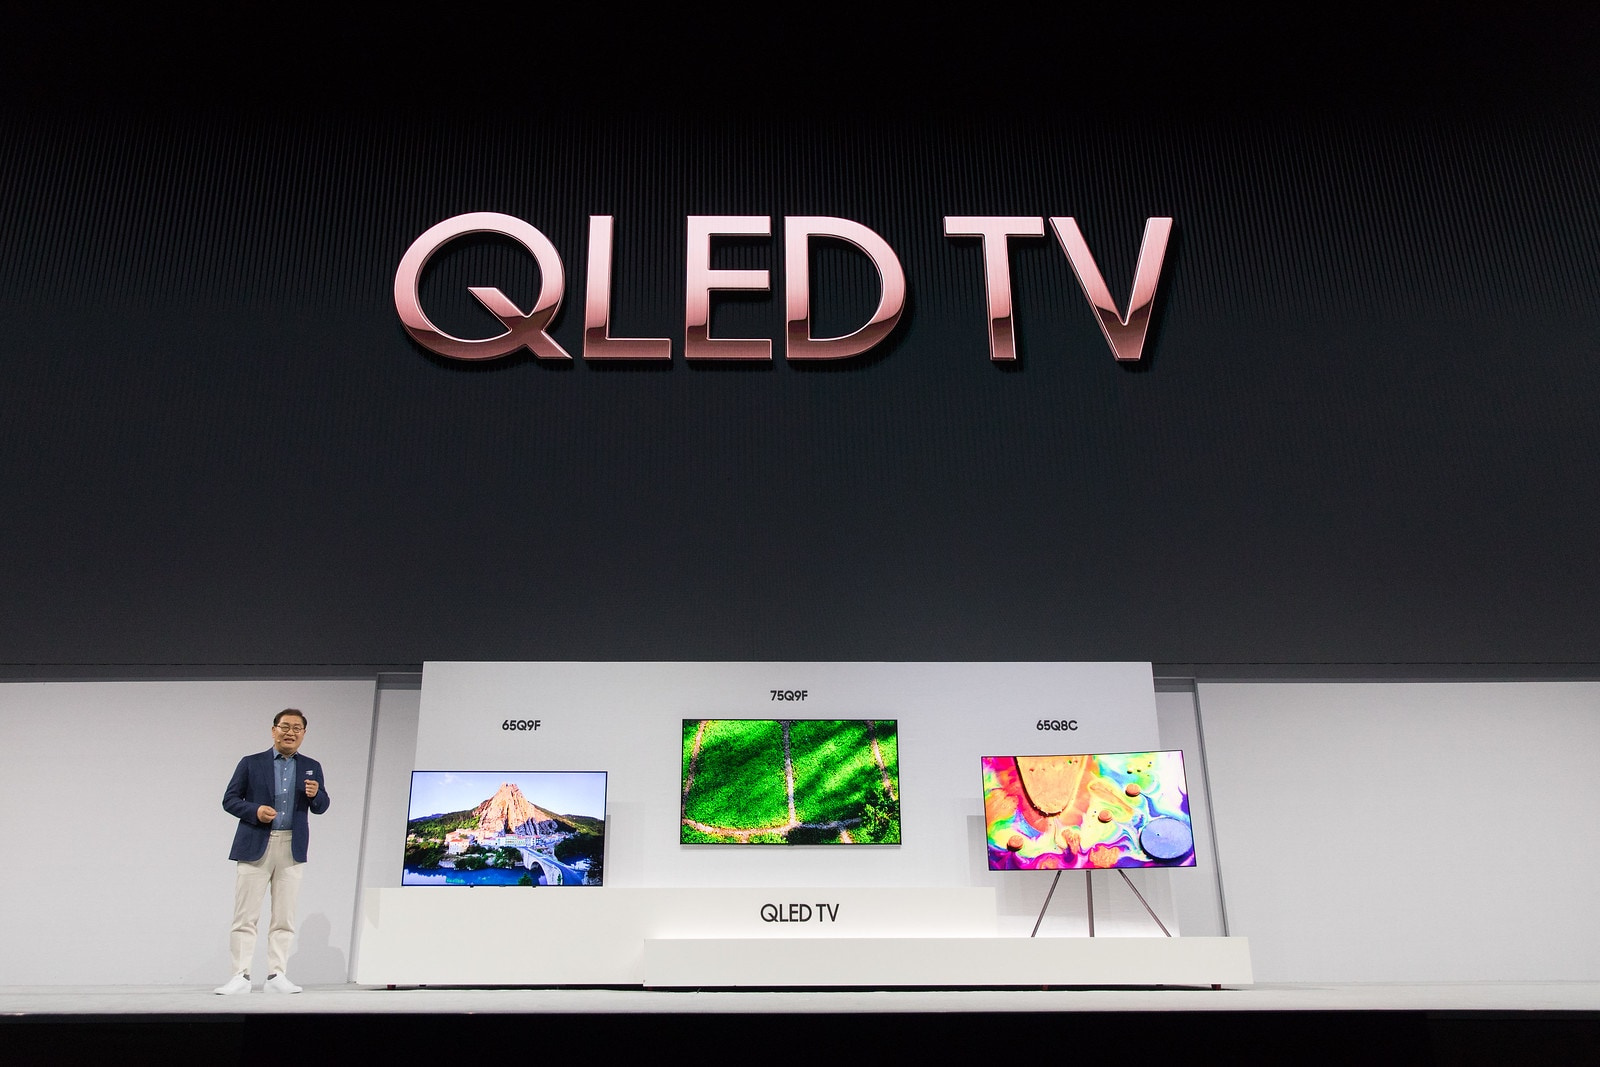 Jonghee-Han-President-of-Visual-Display-Business-at-Samsung-Electronics-introducing-the-new-2018-QLED-TVs1